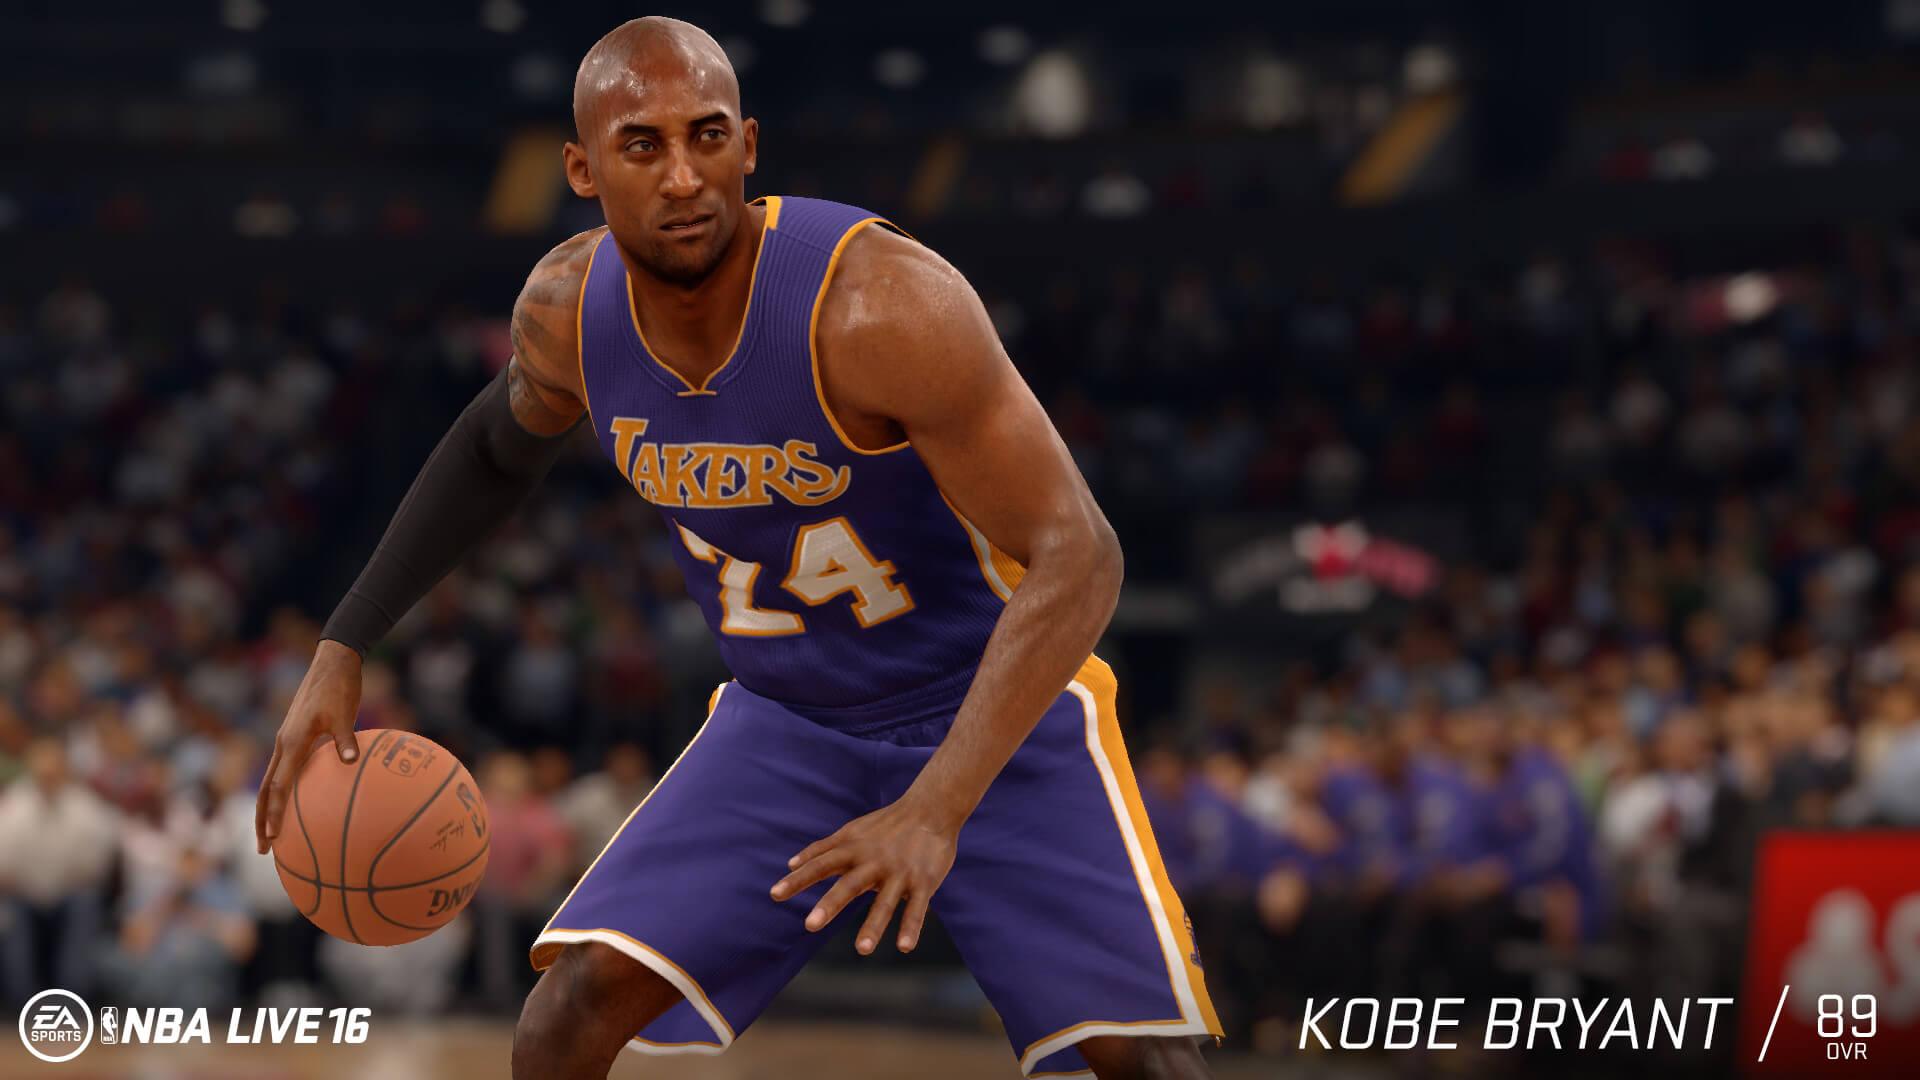 nba live 16 reveals player ratings via screens rh trueachievements com NBA Live 10 NBA Live 16